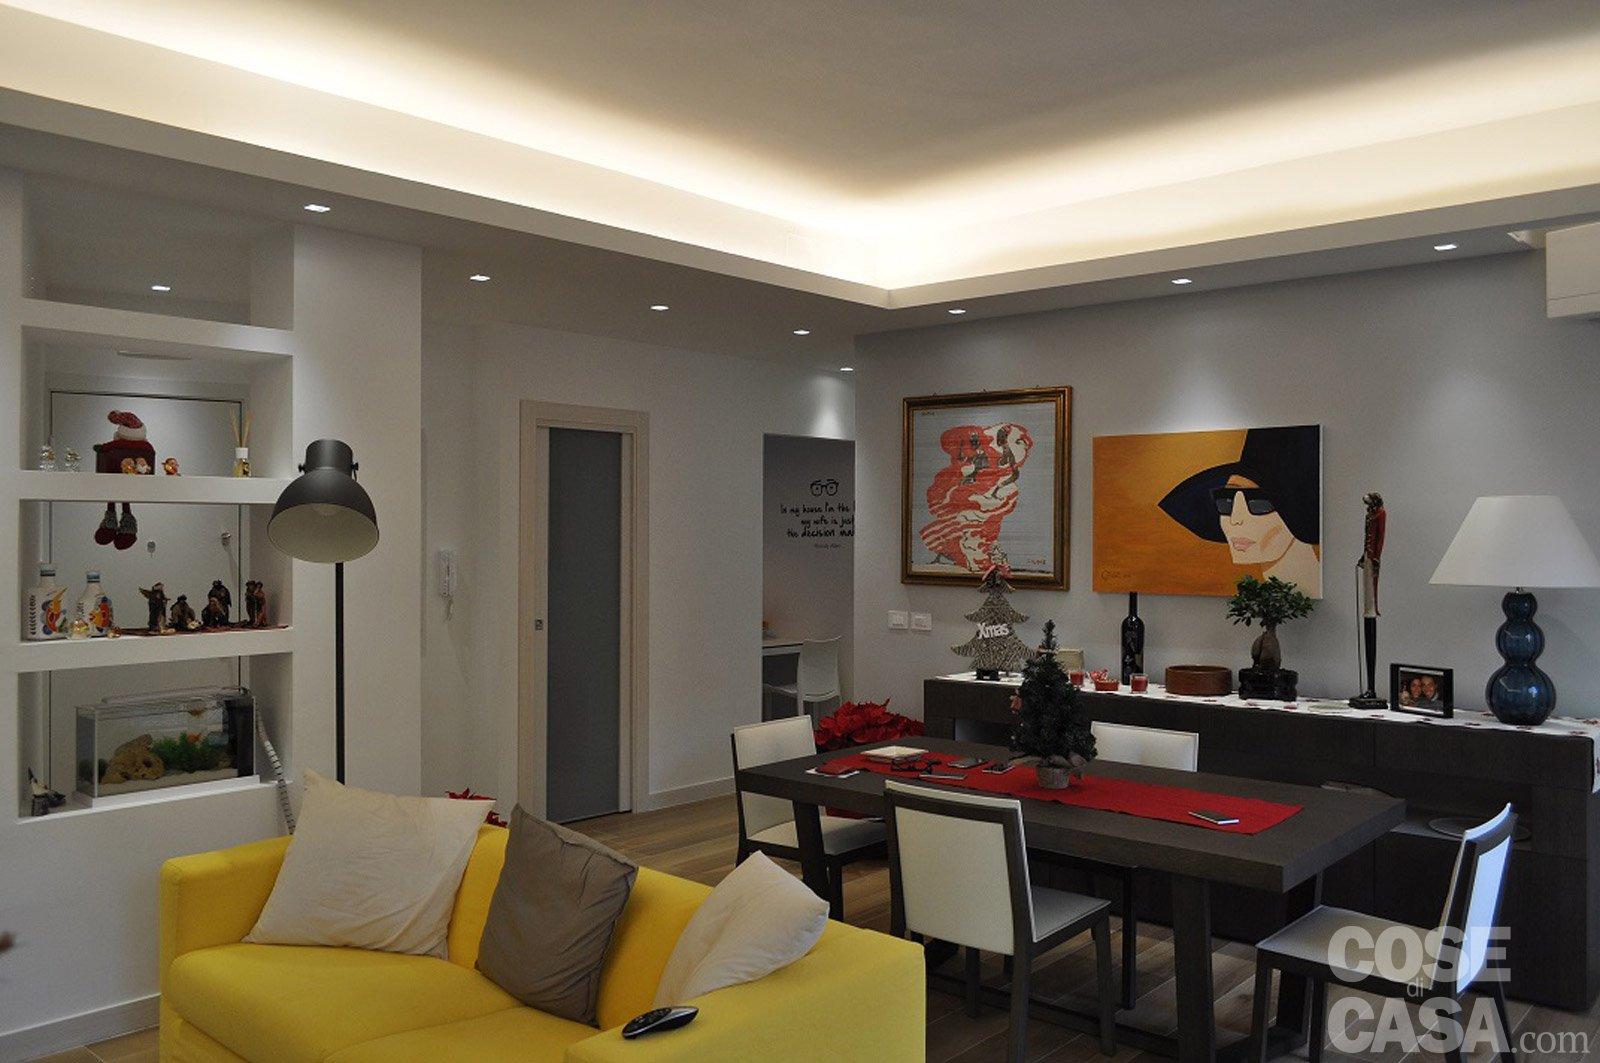 90 mq una casa da vivere in relax cose di casa for Immagini di appartamenti ristrutturati